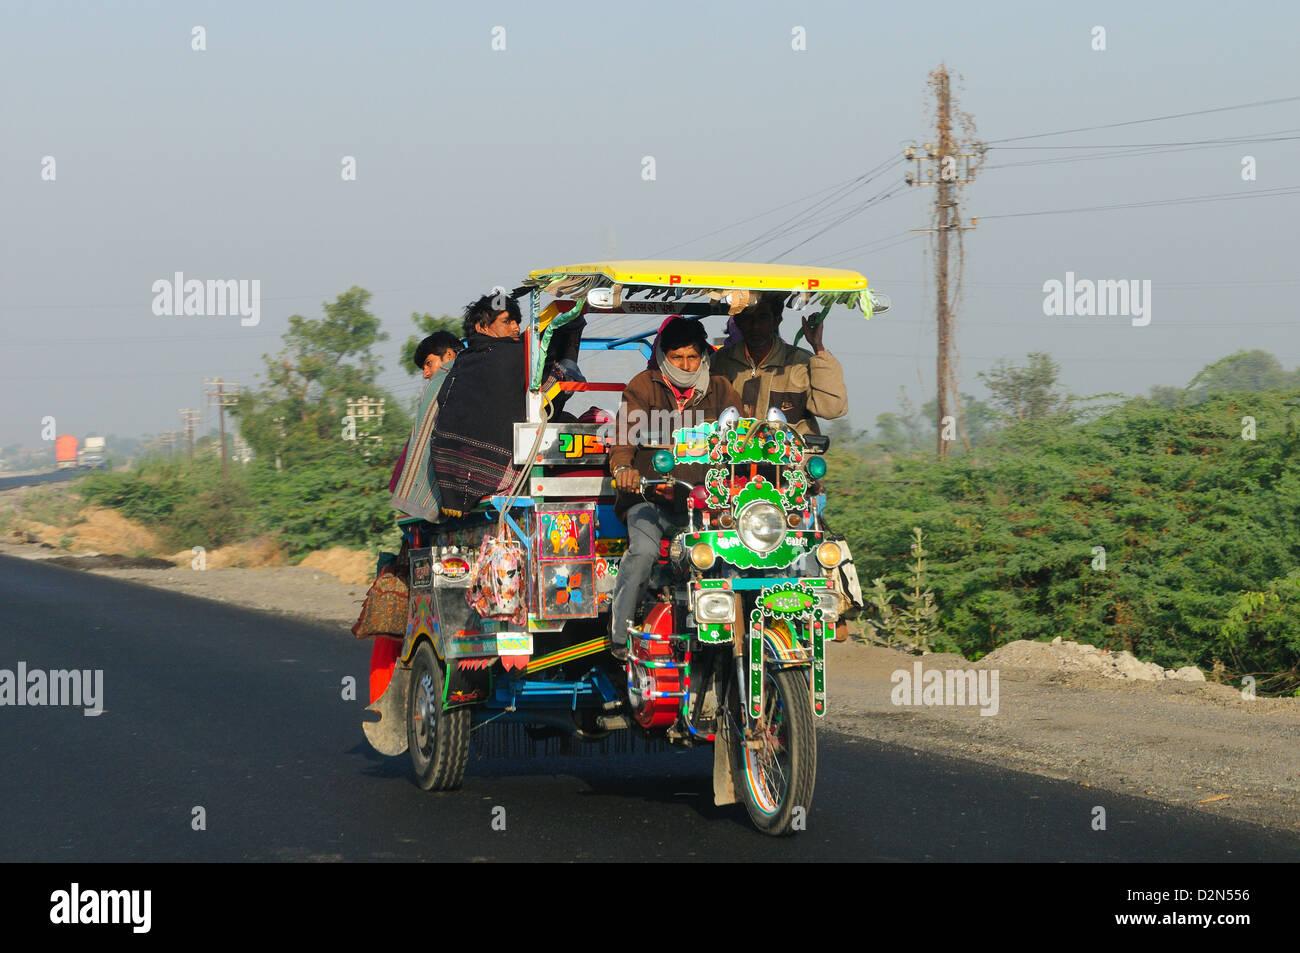 Road transportation in rural India, Gujarat, India, Asia - Stock Image